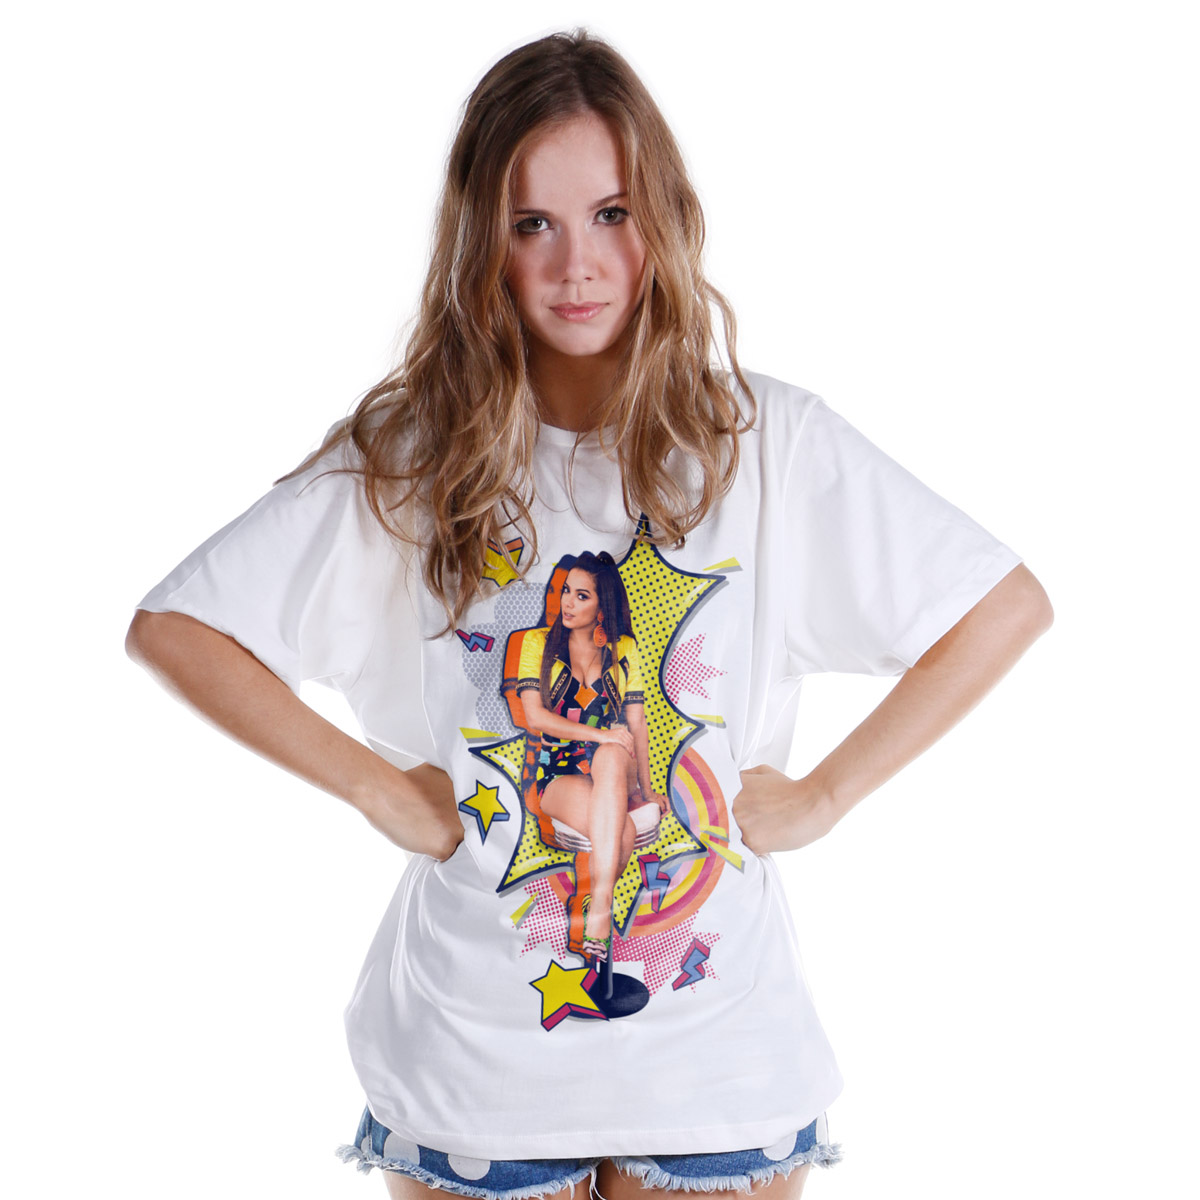 Camisetão Anitta Pop Art